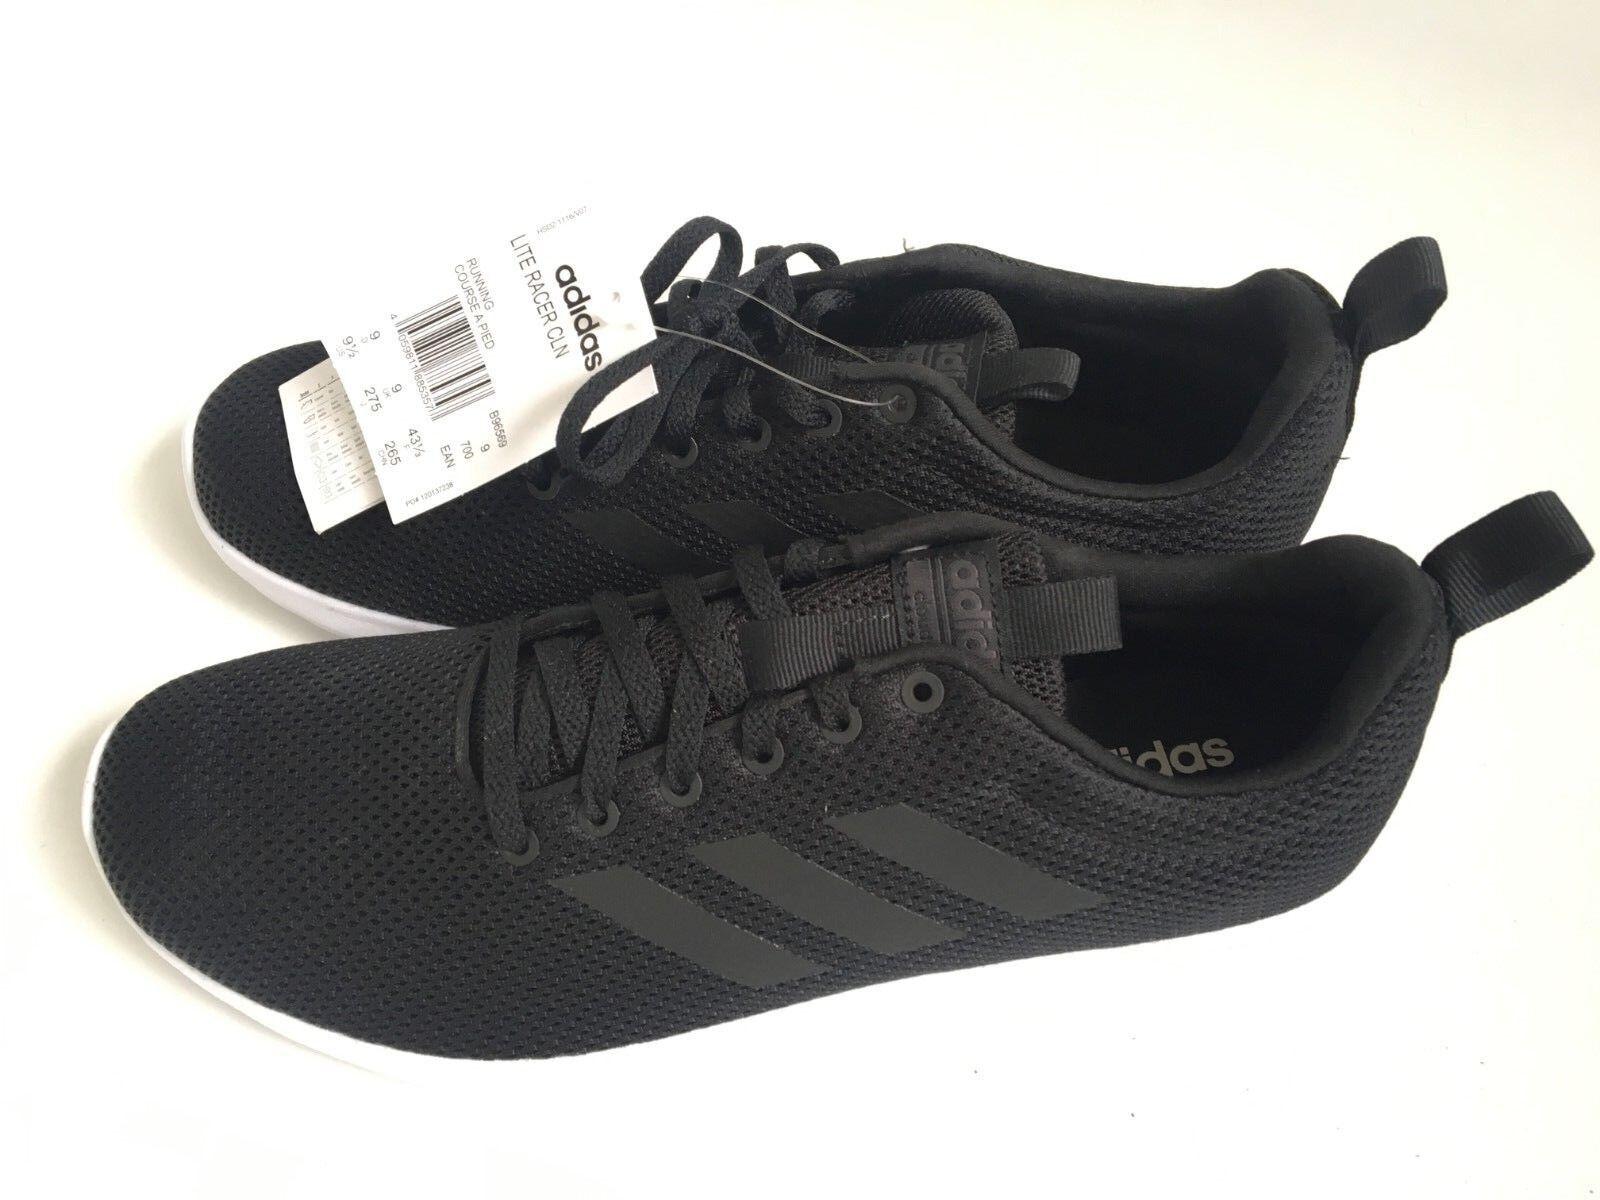 Adidas Lite Racer CLN Trainers - Size 9 - Black - Cloudfoam -B96569